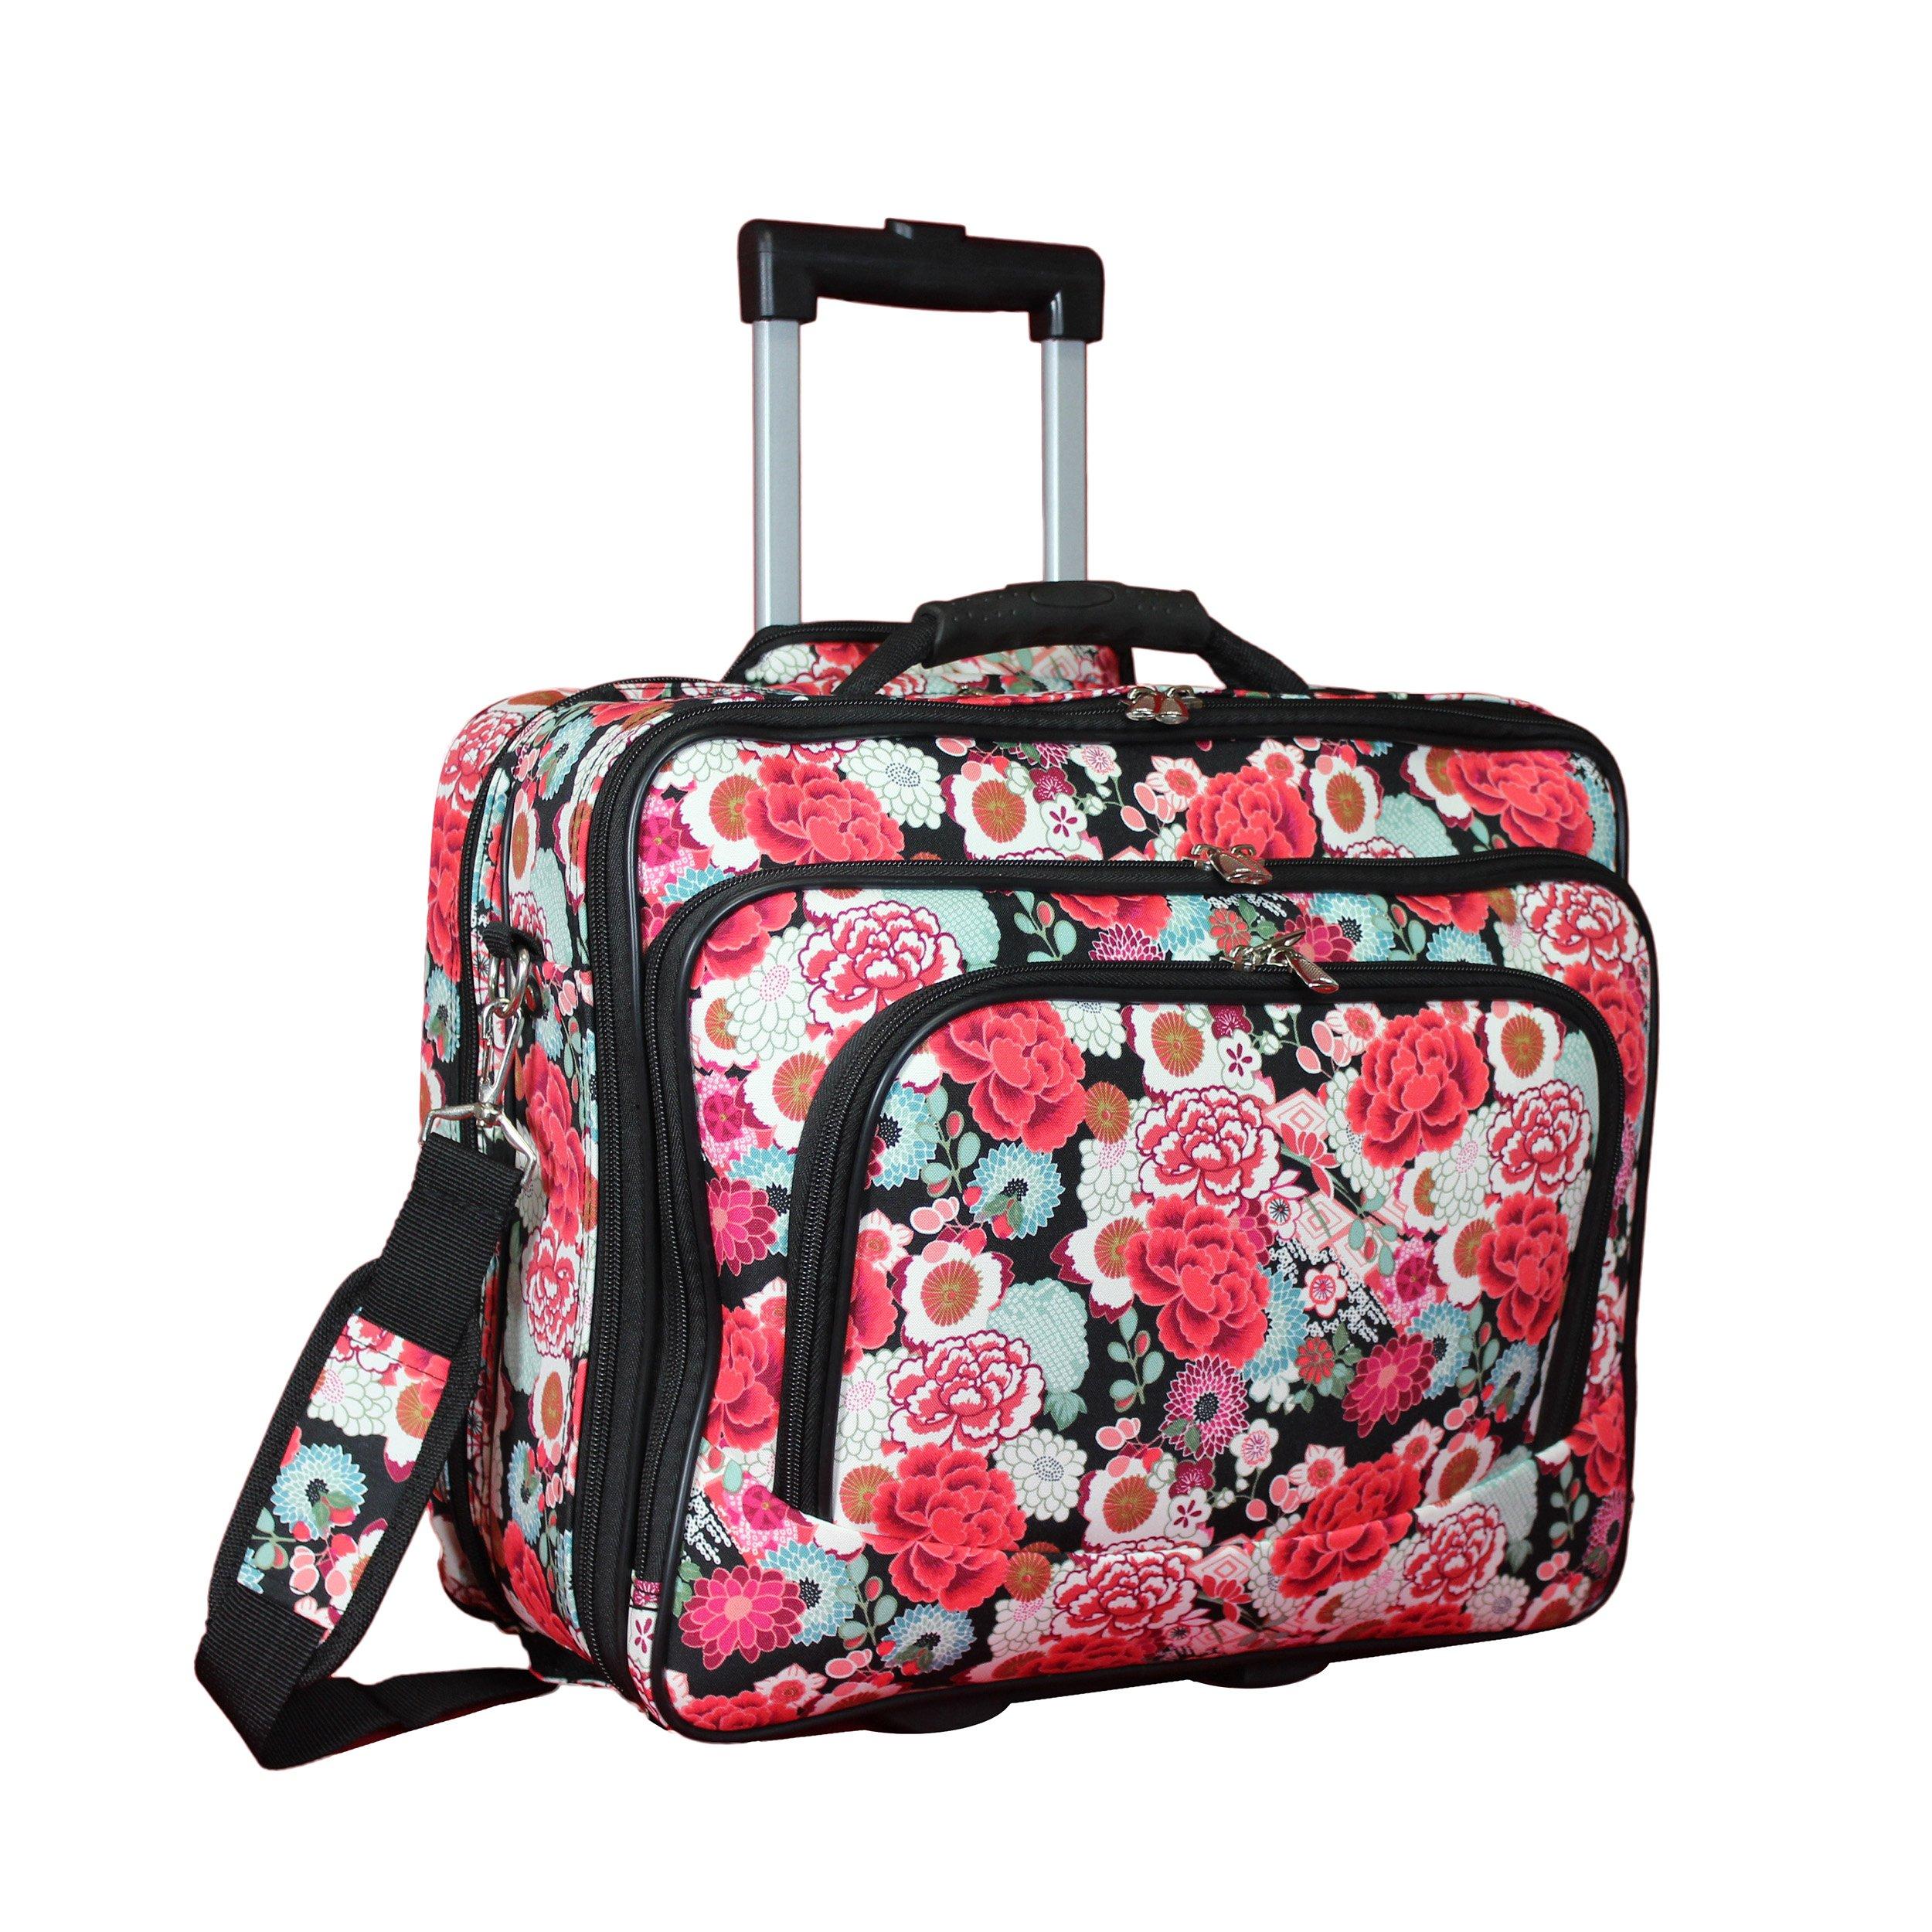 World Traveler Women's Fashion Print Rolling 17'' Laptop Case-Flowers Bag, One Size